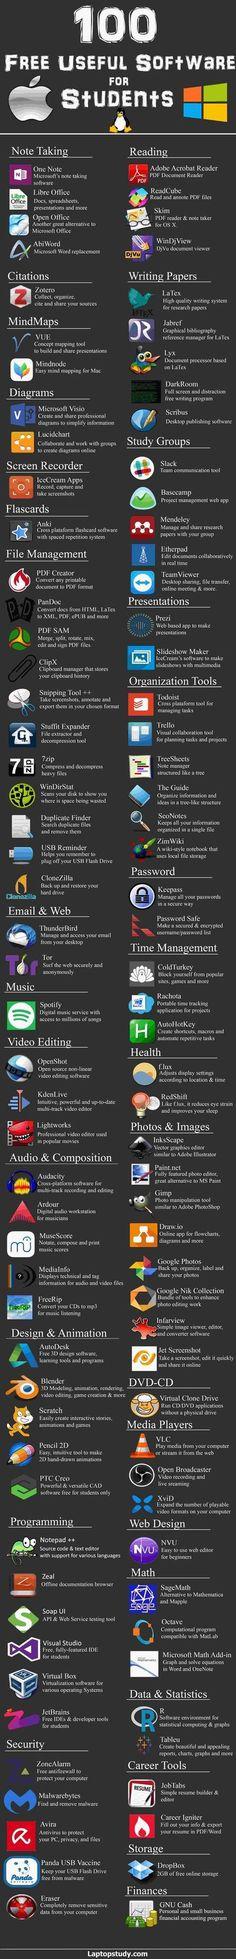 College hacks School hacks Educational websites Hacking computer Life hacks School The internet s bi College Hacks, School Hacks, College Checklist, College Dorms, College School, School Office, Life Hacks, School Study Tips, Educational Websites